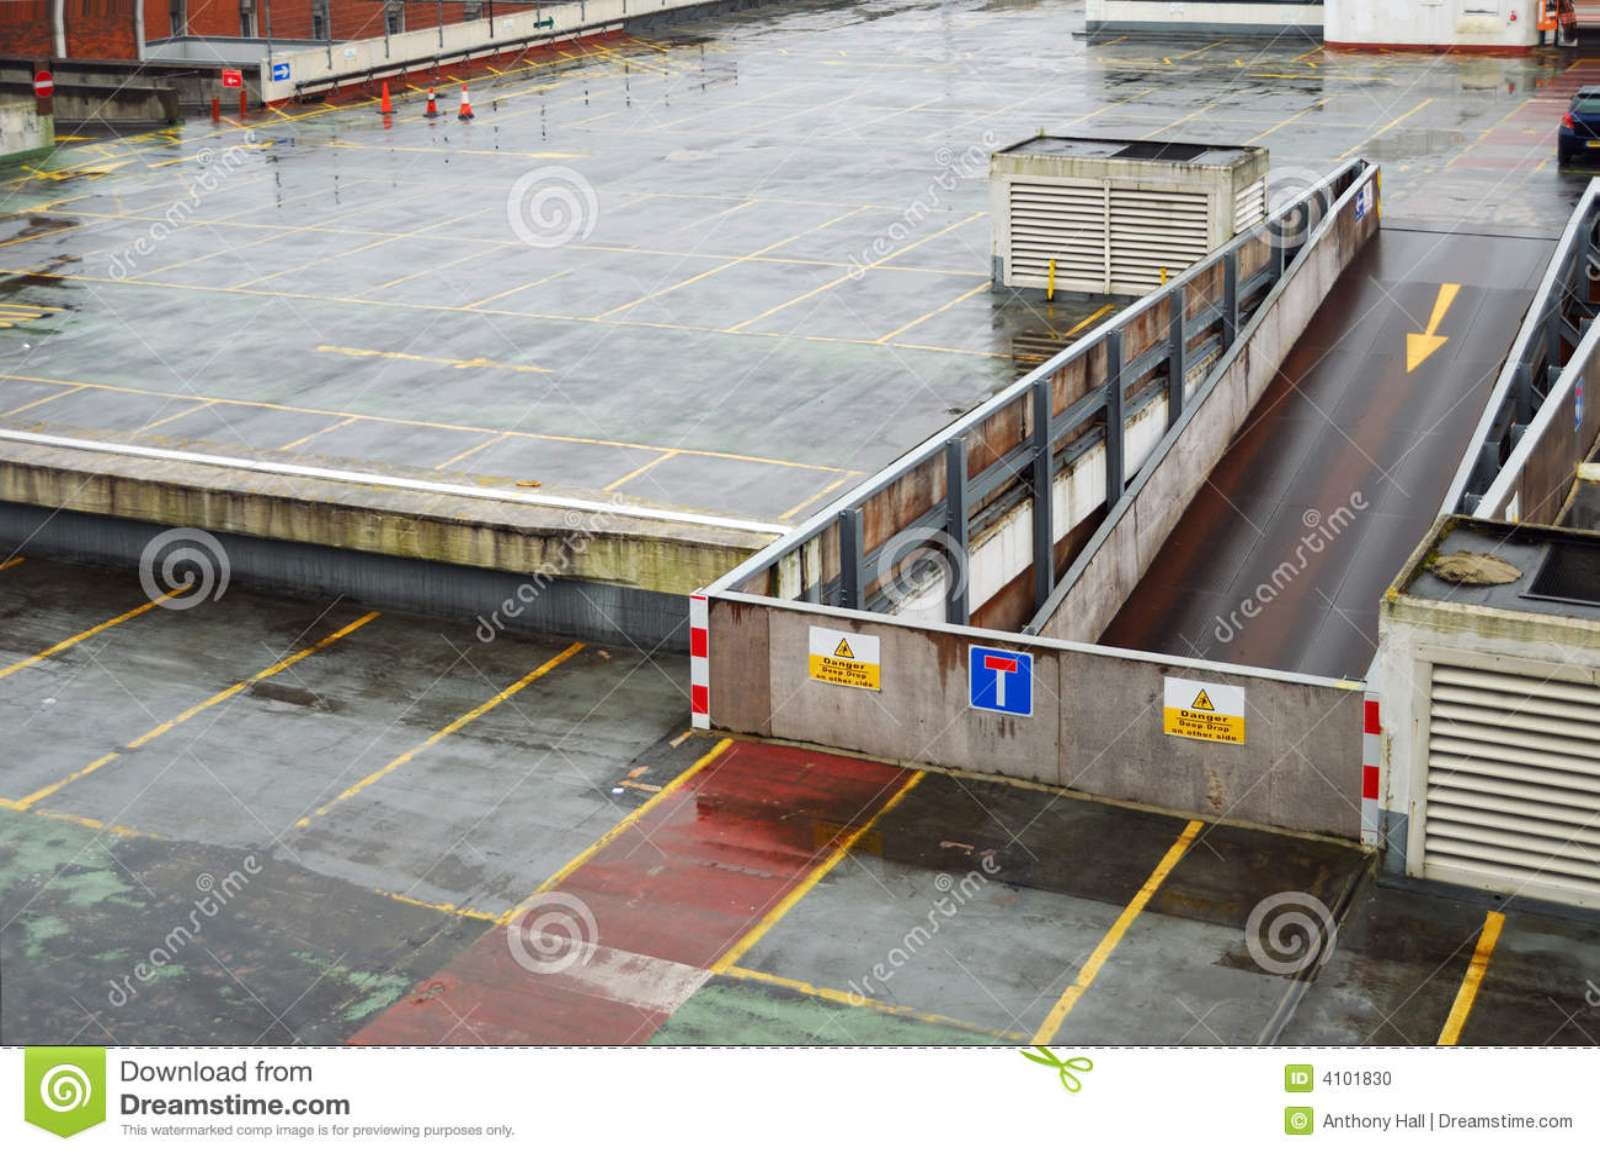 8 Car Garage Plans >> Rainy Parking Garage Roof Deck Stock Photo - Image: 4101830